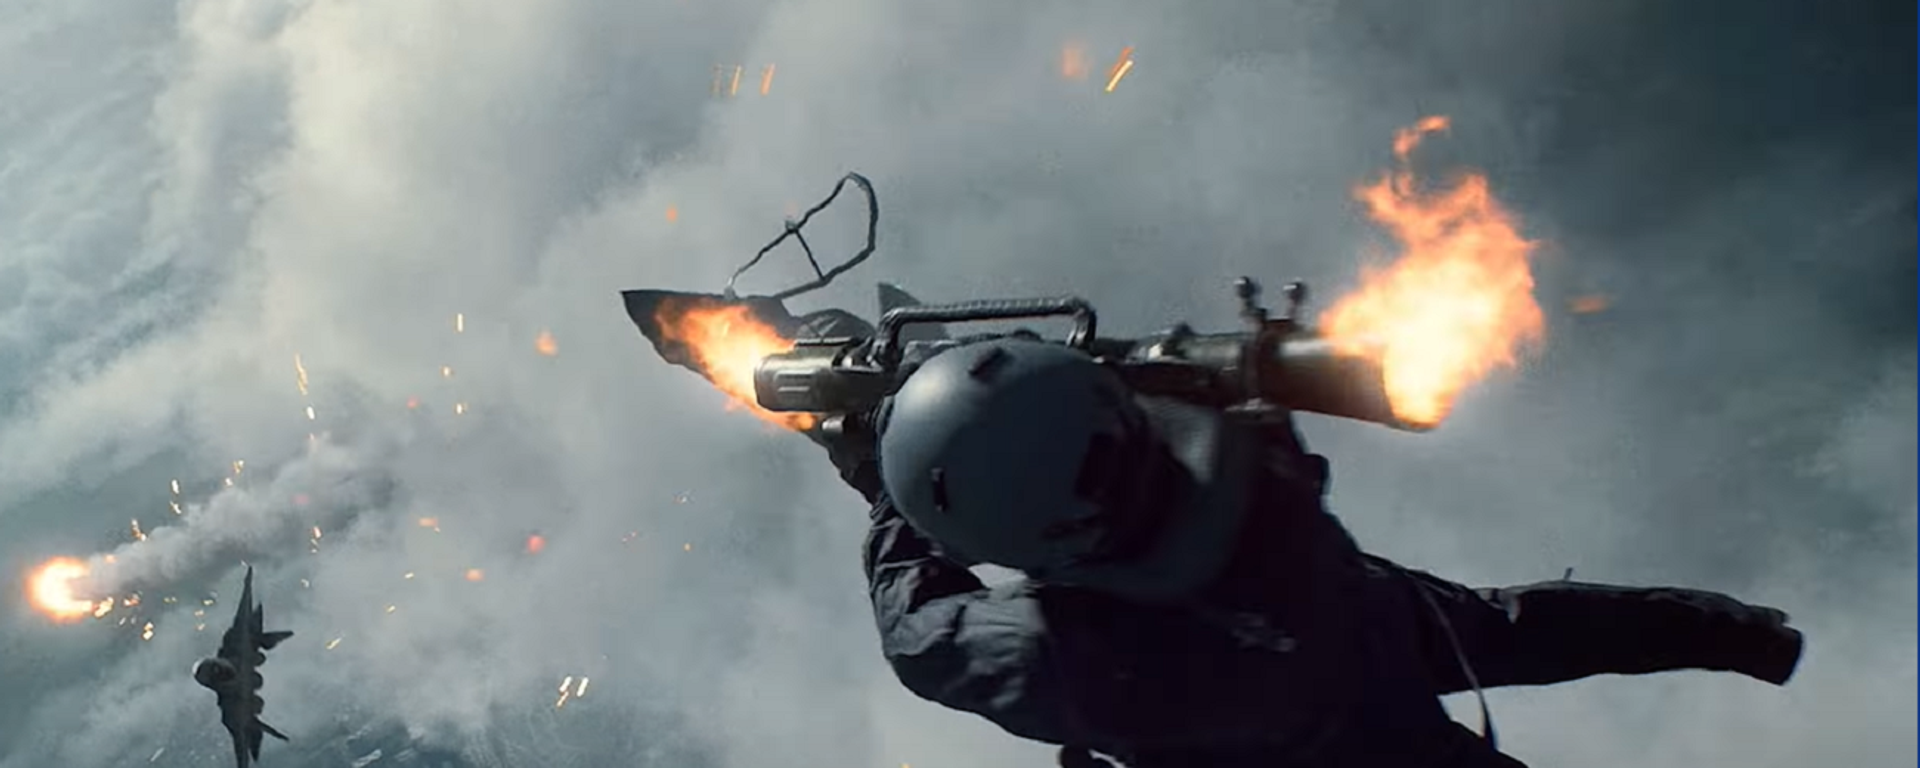 'Battlefield 2042', captura de pantalla - Sputnik Mundo, 1920, 14.06.2021